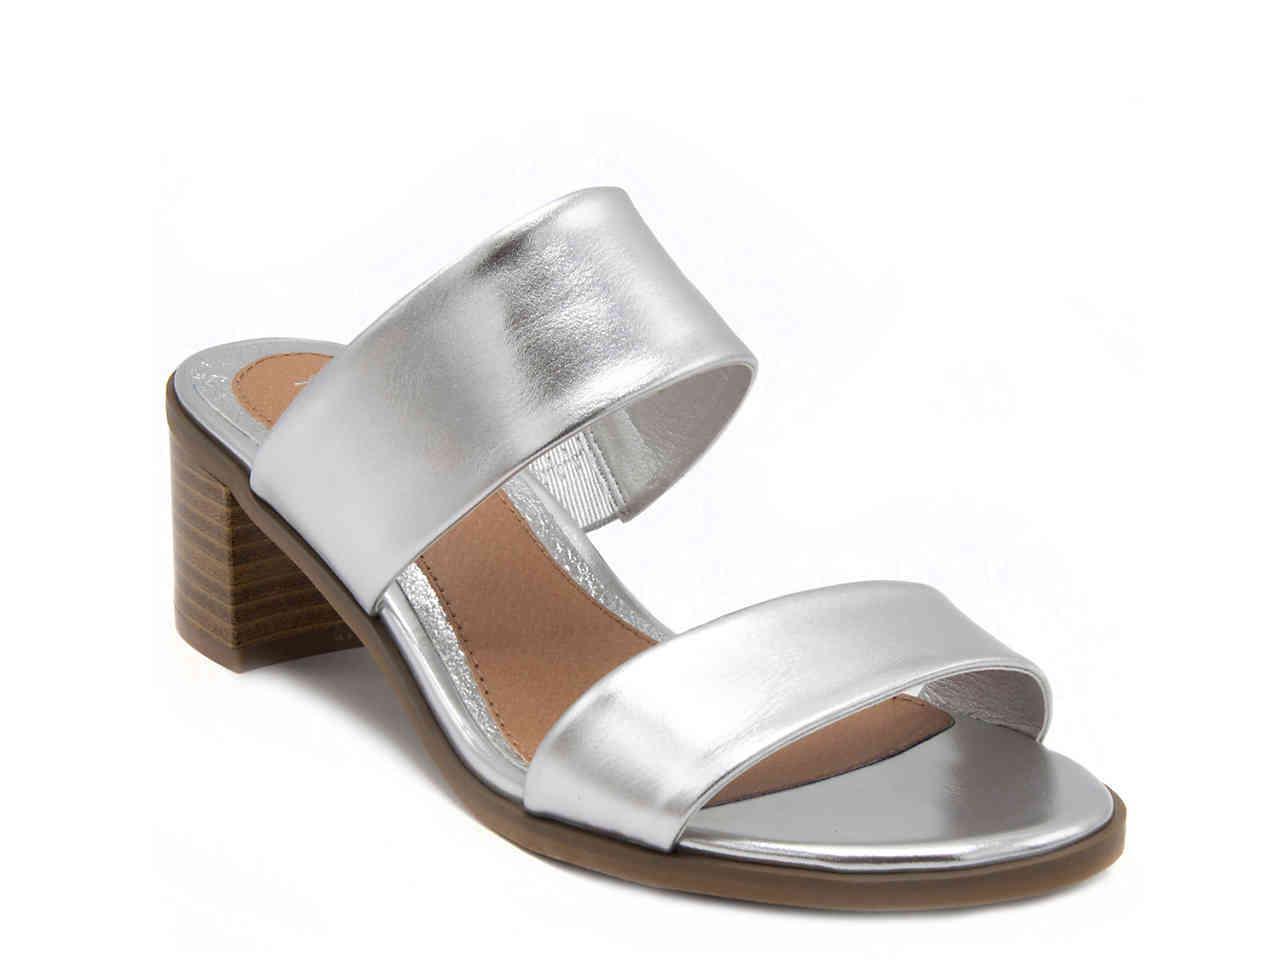 bff00a4b9 Lyst - Rampage Hatty Sandal in Metallic